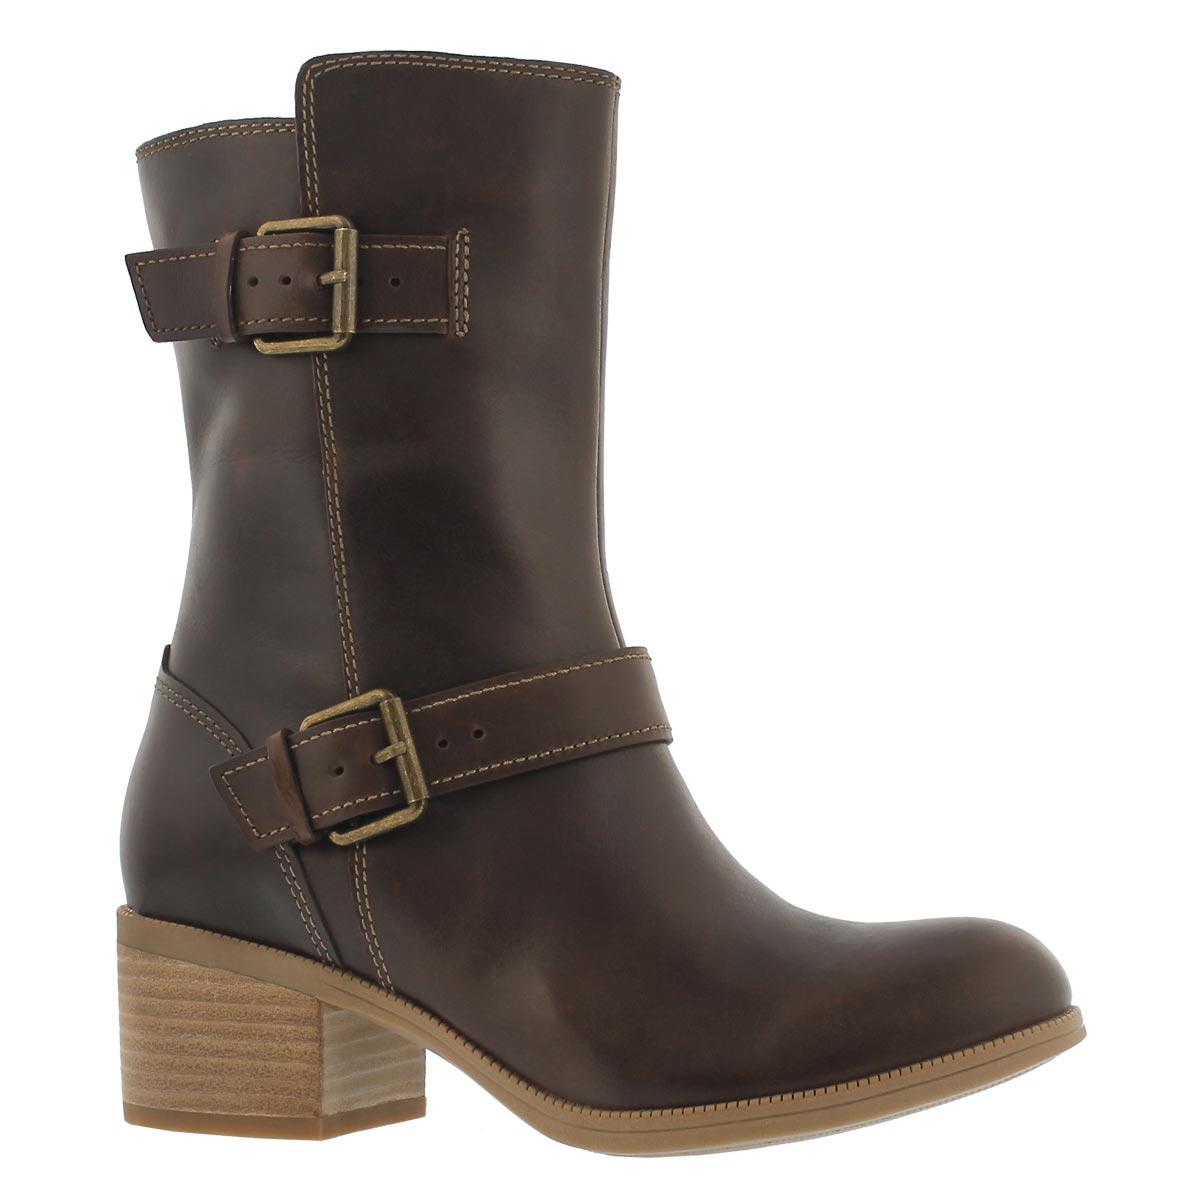 Women's MAYPEARL OASIS dark tan mid-calf boots